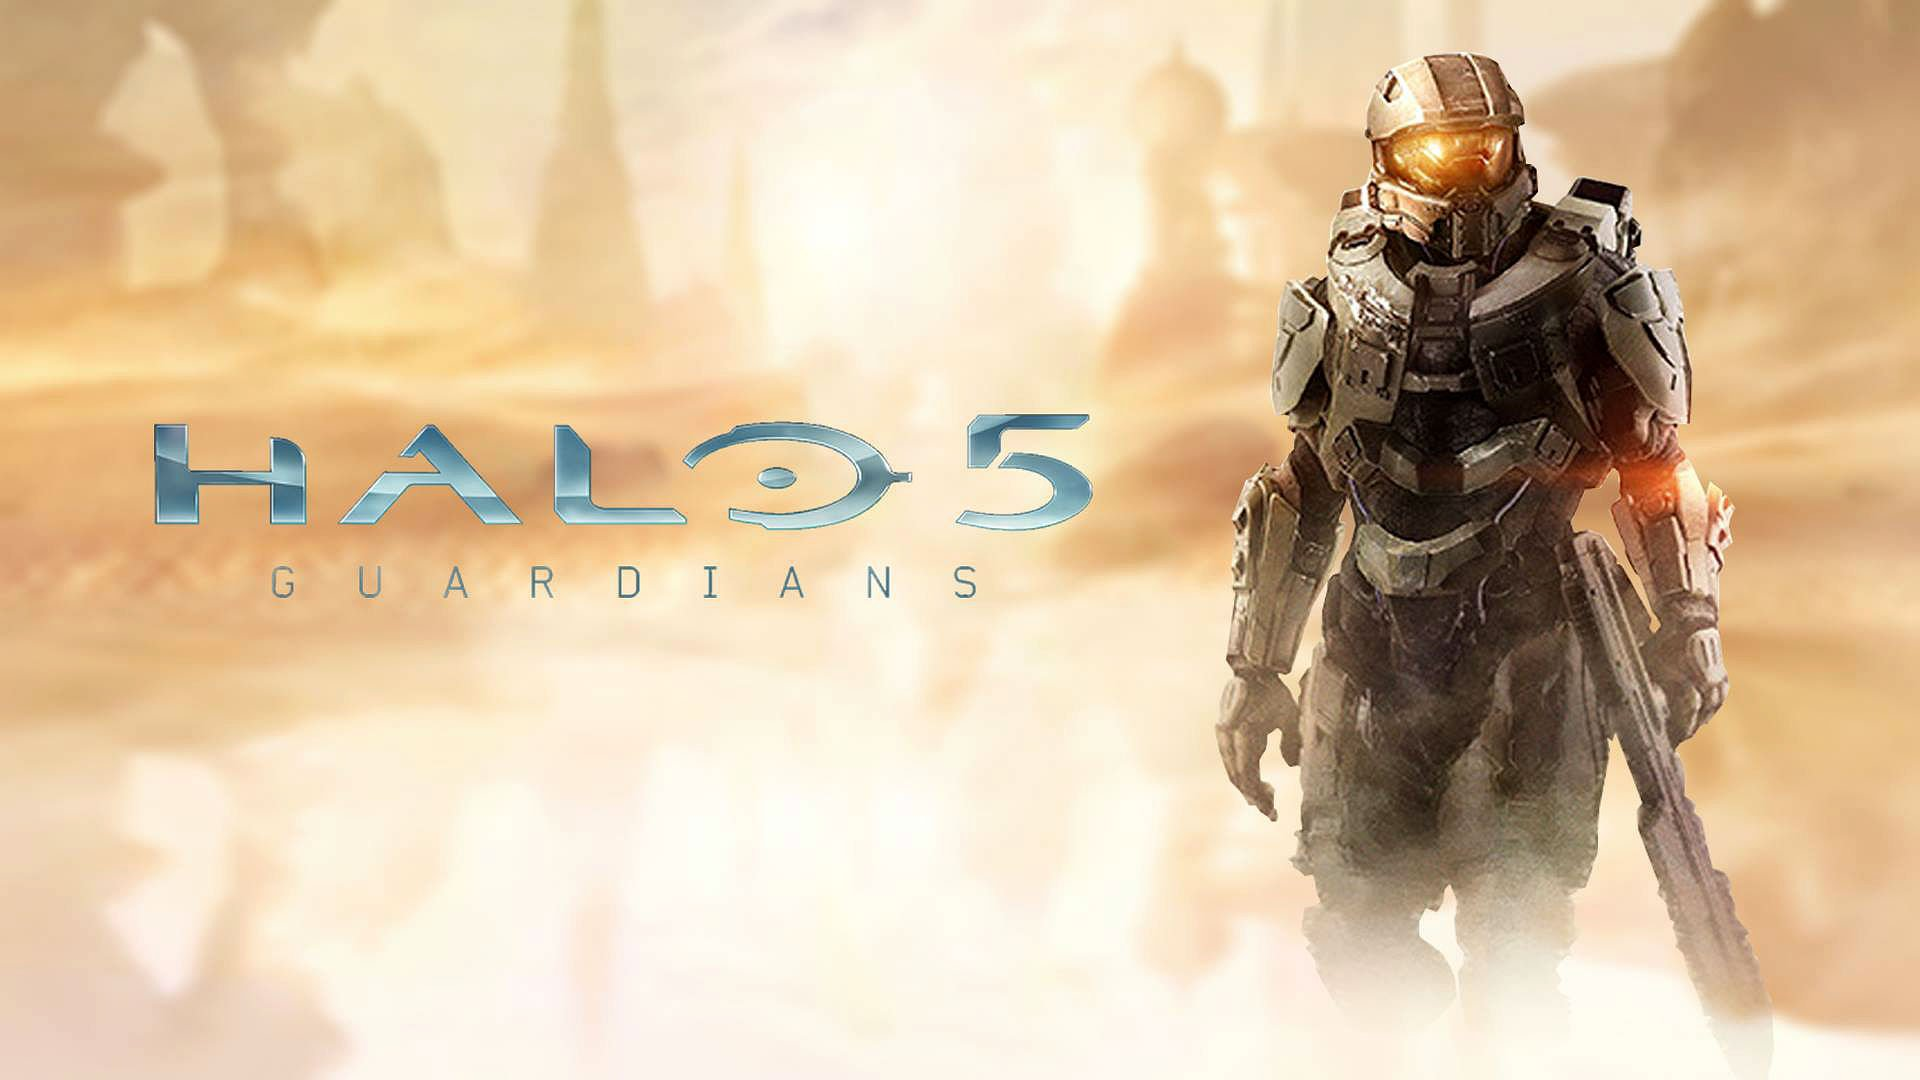 Halo 5 Guardians Hd Wallpaper 1920x1080 Gludy